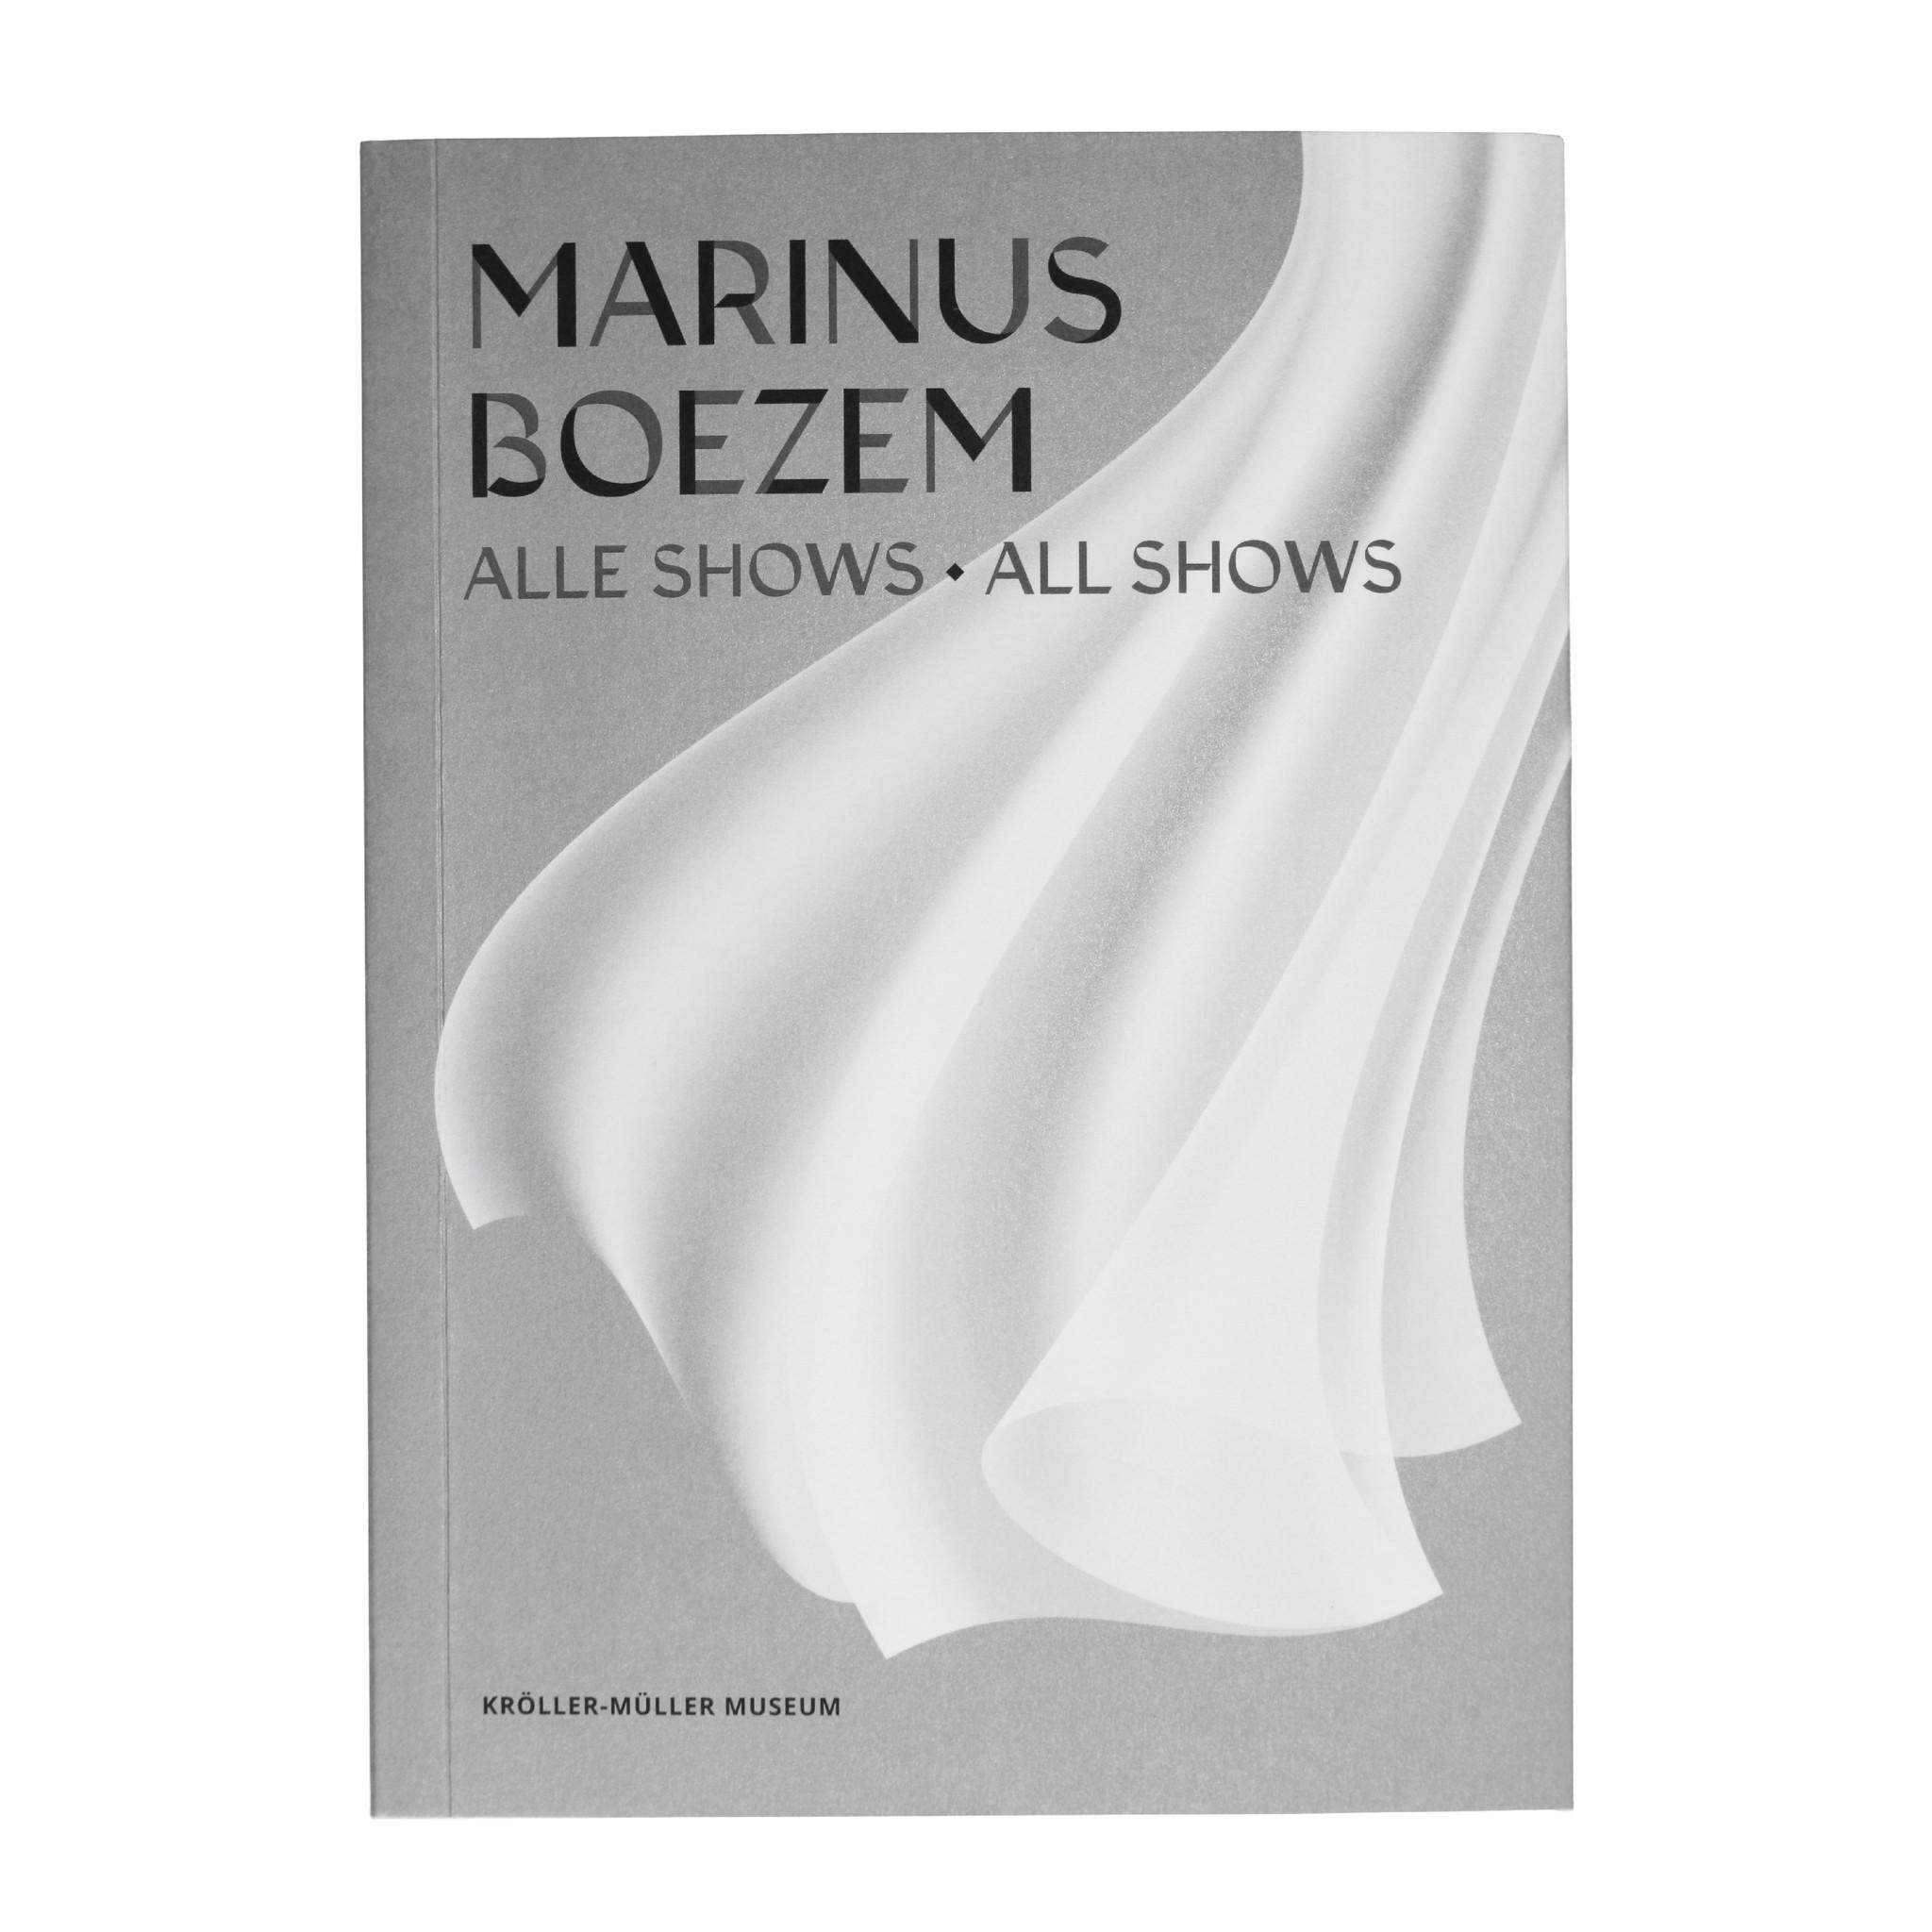 Marinus Boezem. Alle shows - limited edition